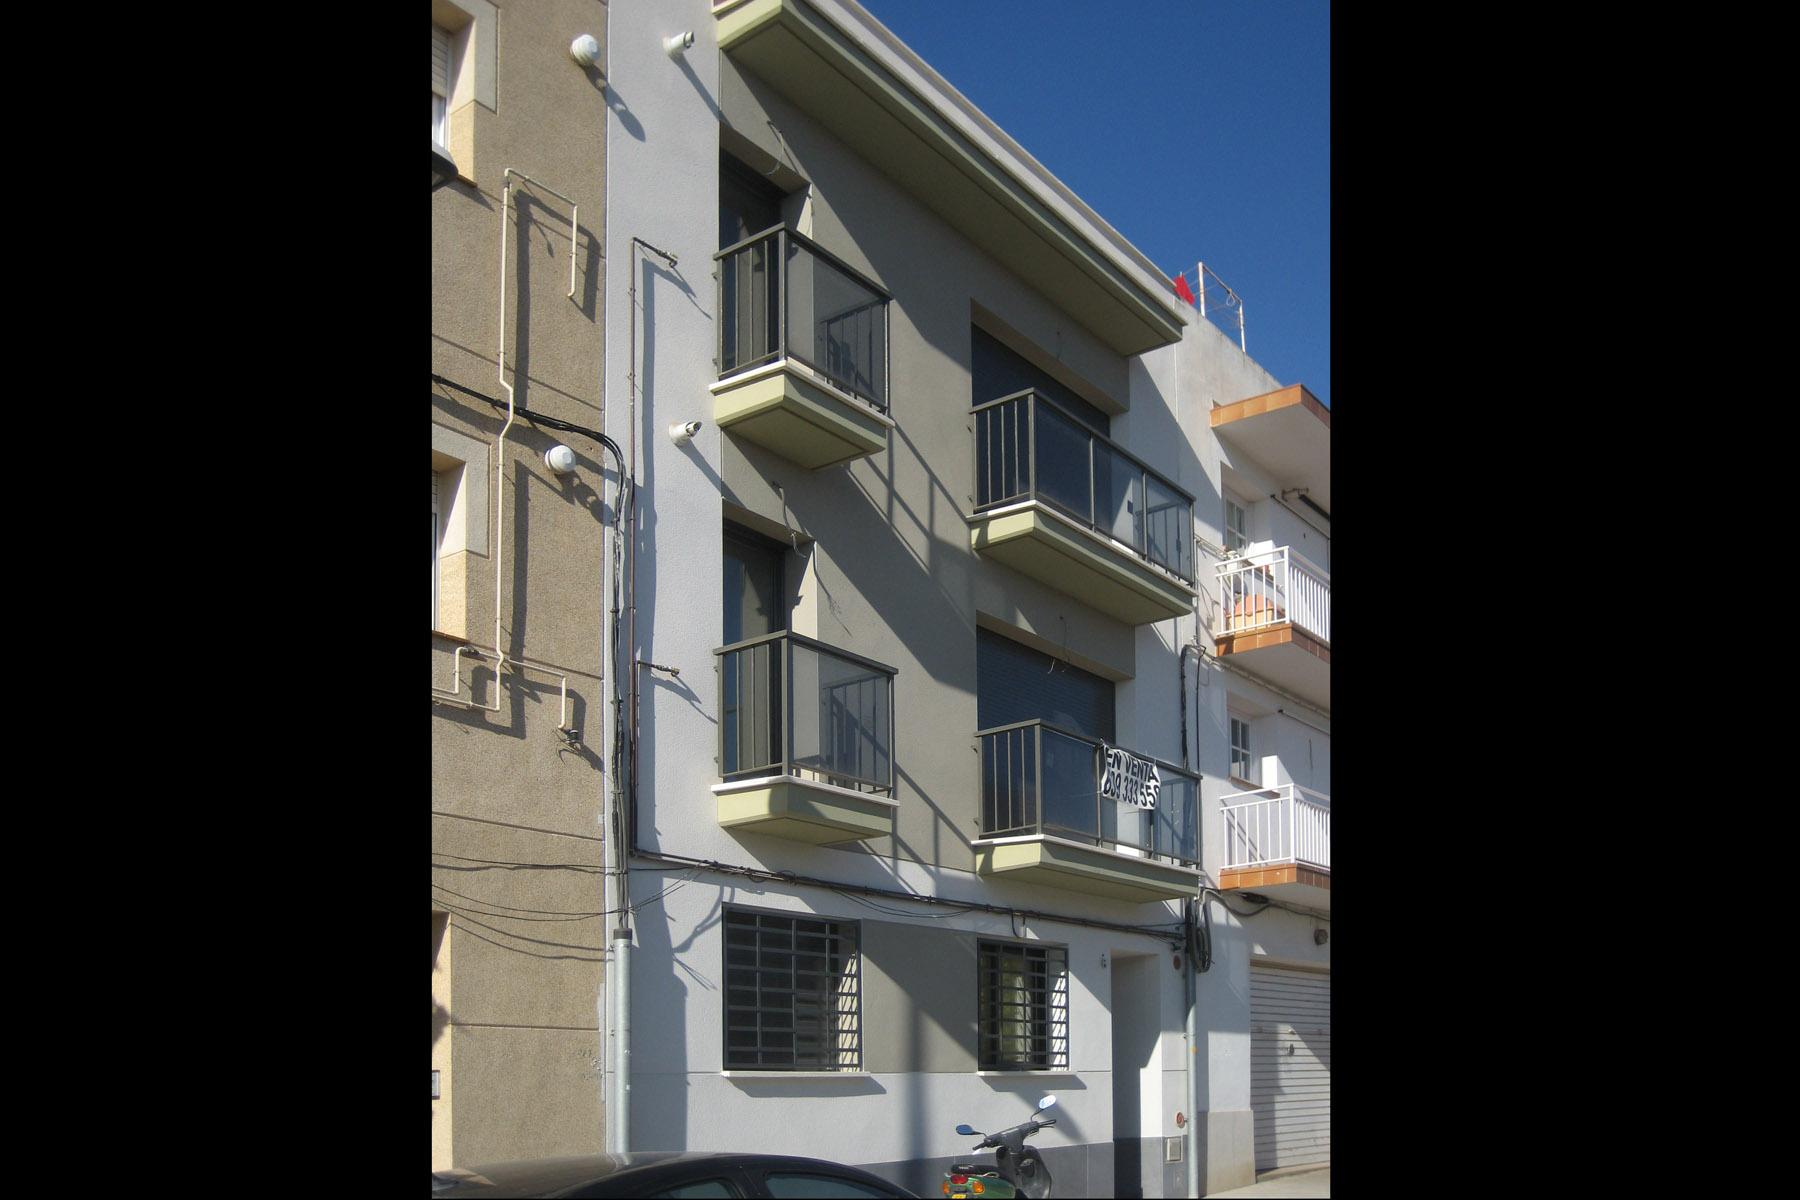 Vivienda-Plurifamiliar-Subur-Sant-Pere-Ribes-Barcelona-01